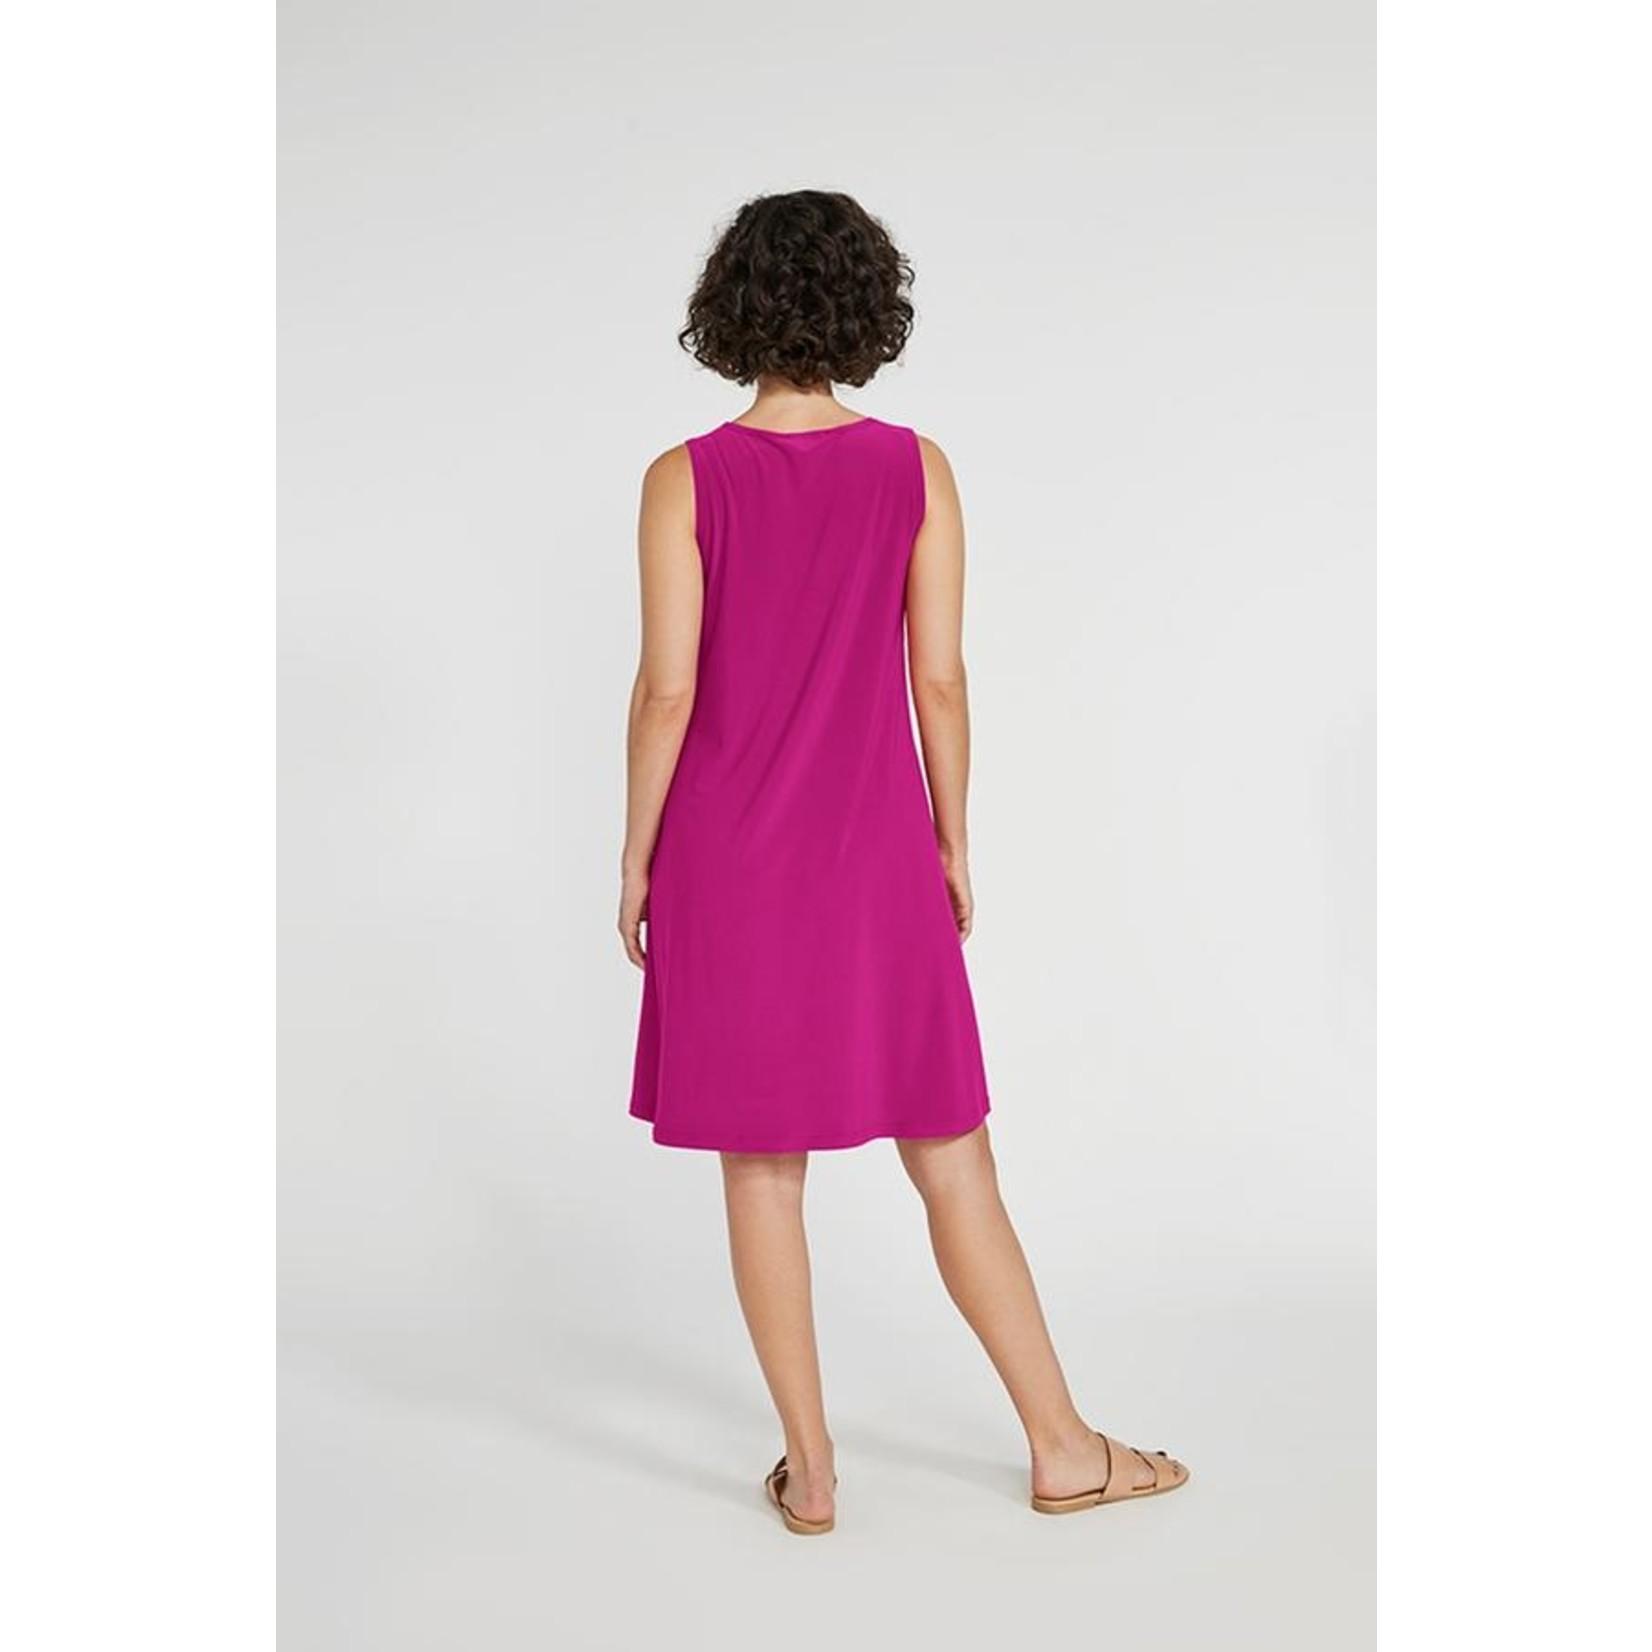 Sympli Sympli Sleeveless Trapeze Dress - Short